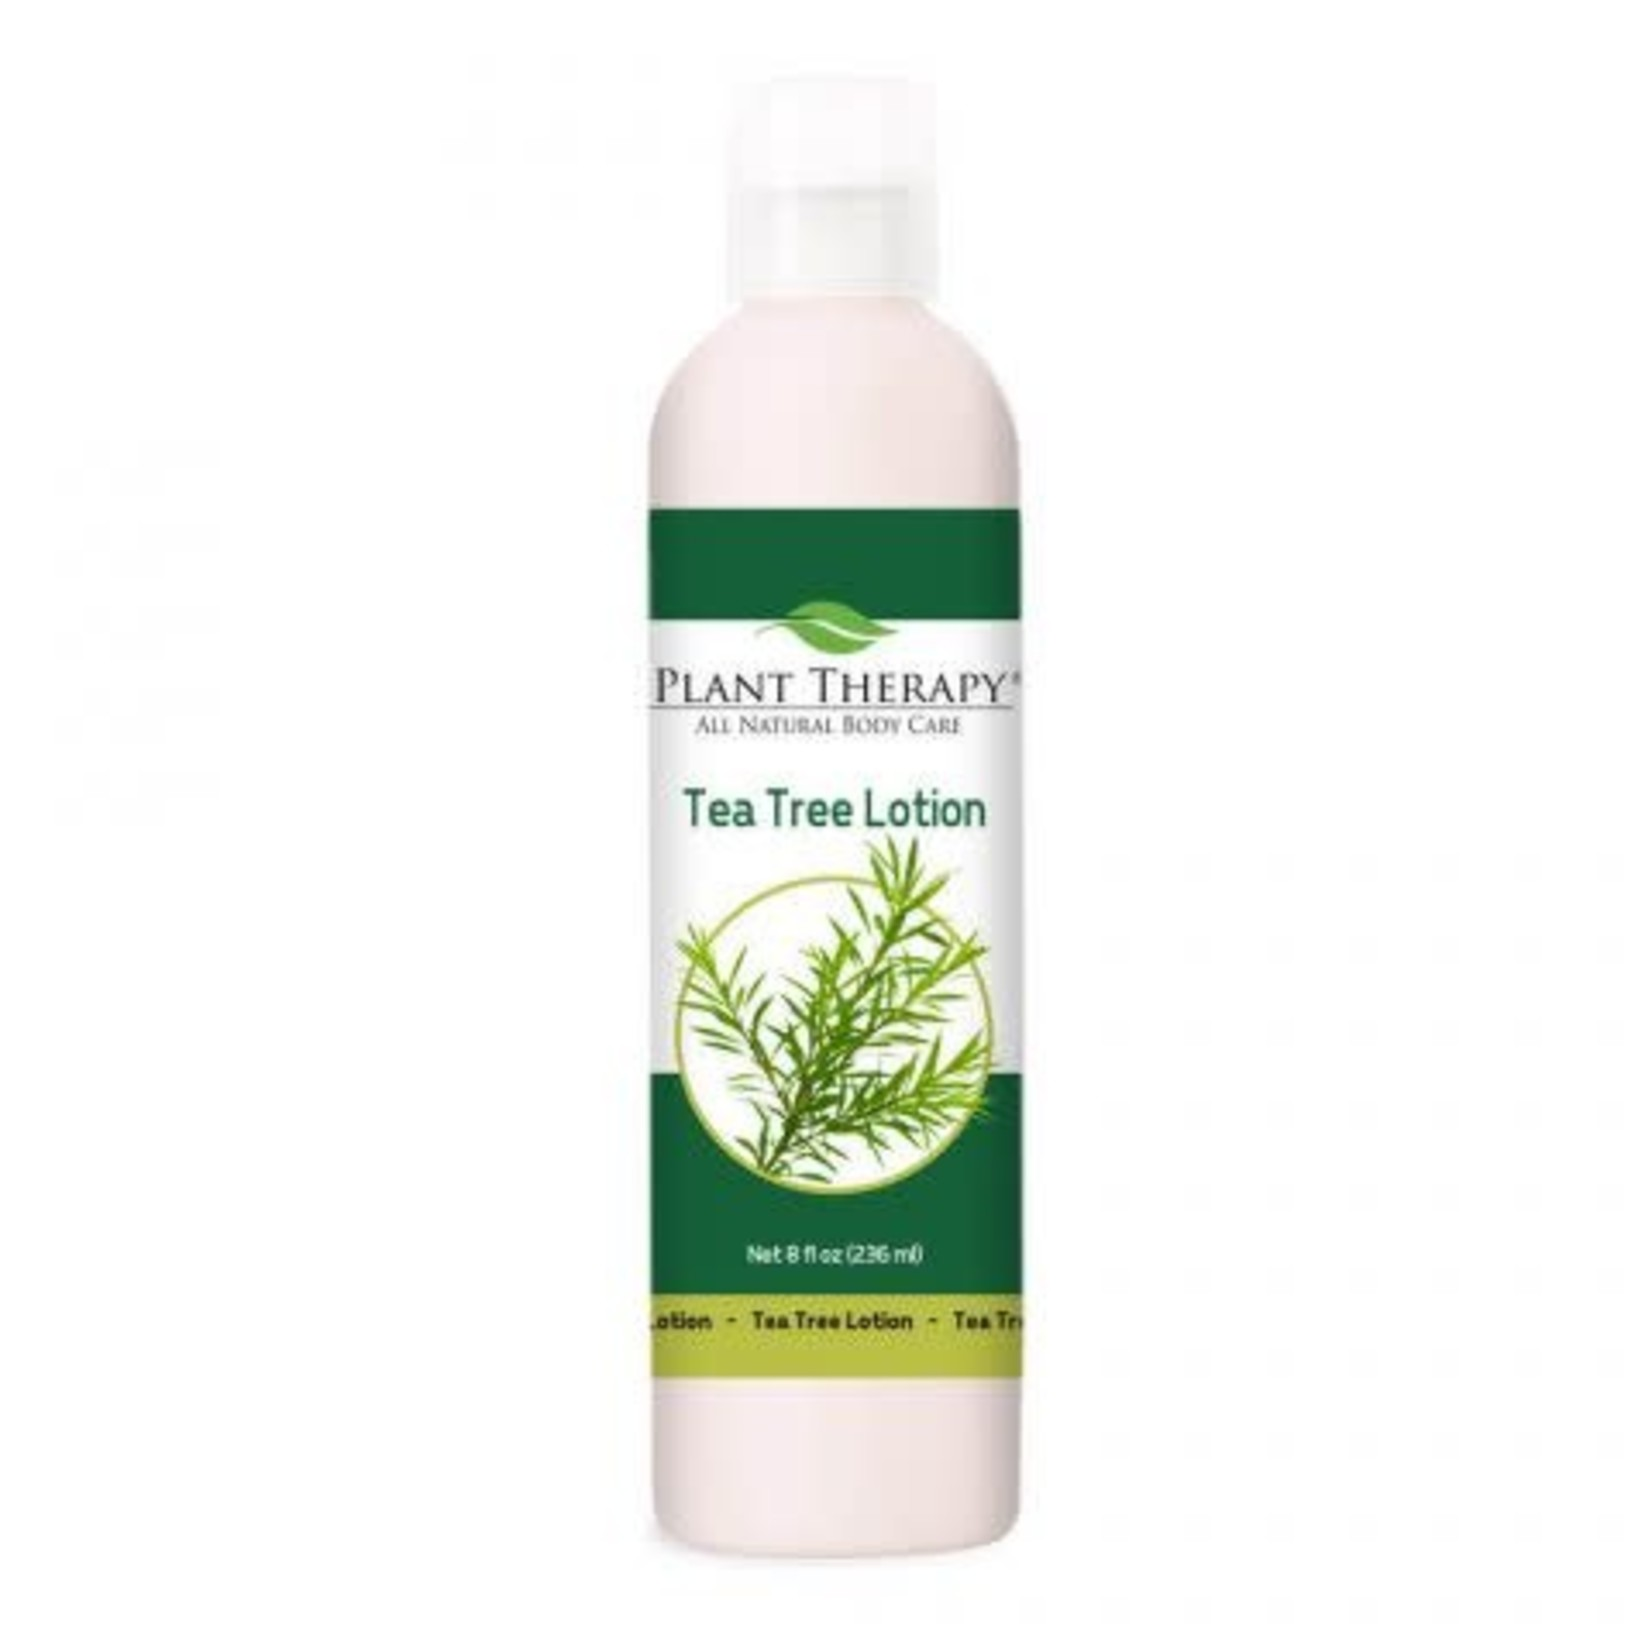 Plant Therapy PT Tea Tree Lotion 8oz